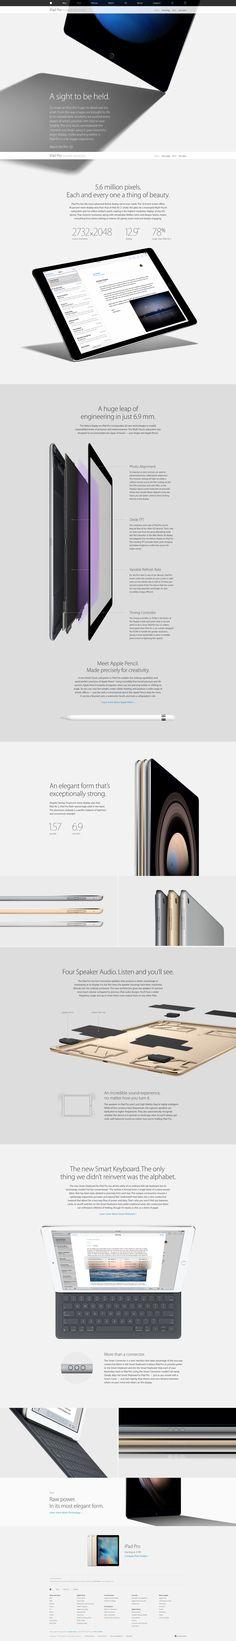 http://www.apple.com/ipad-pro/design/